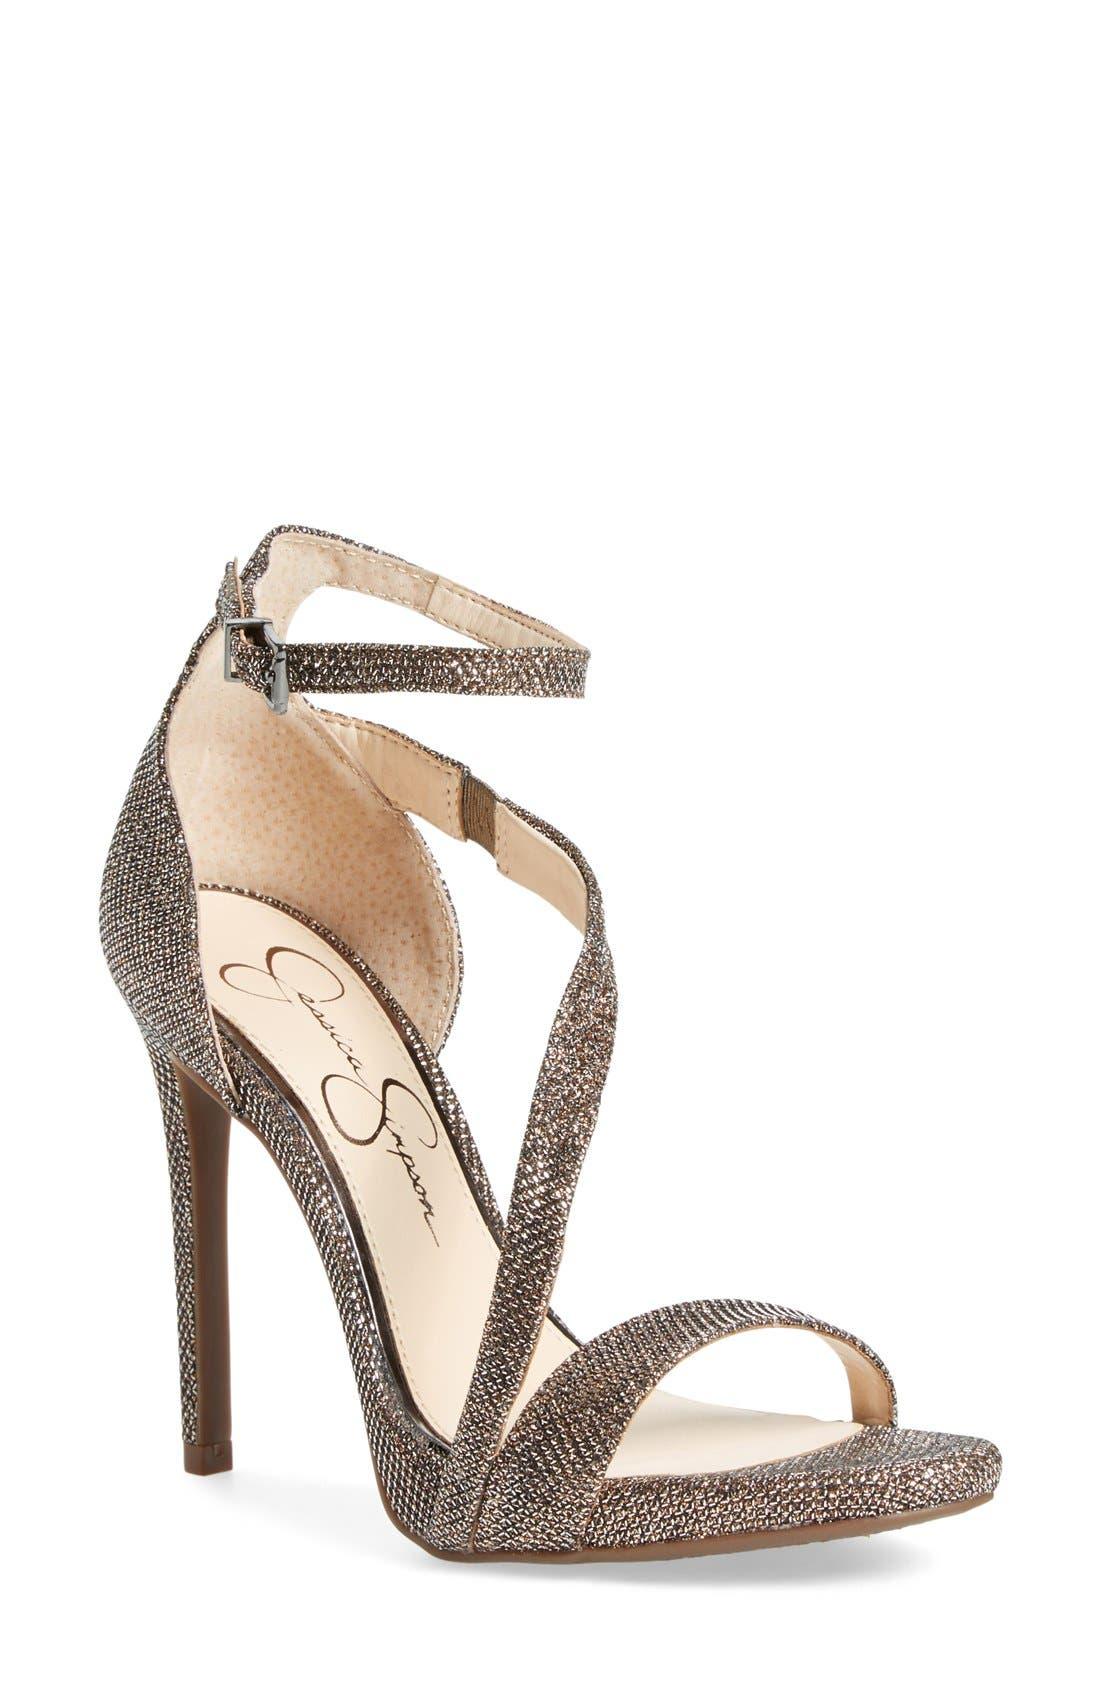 Main Image - Jessica Simpson 'Rayli' Patent Ankle Strap Sandal (Women)